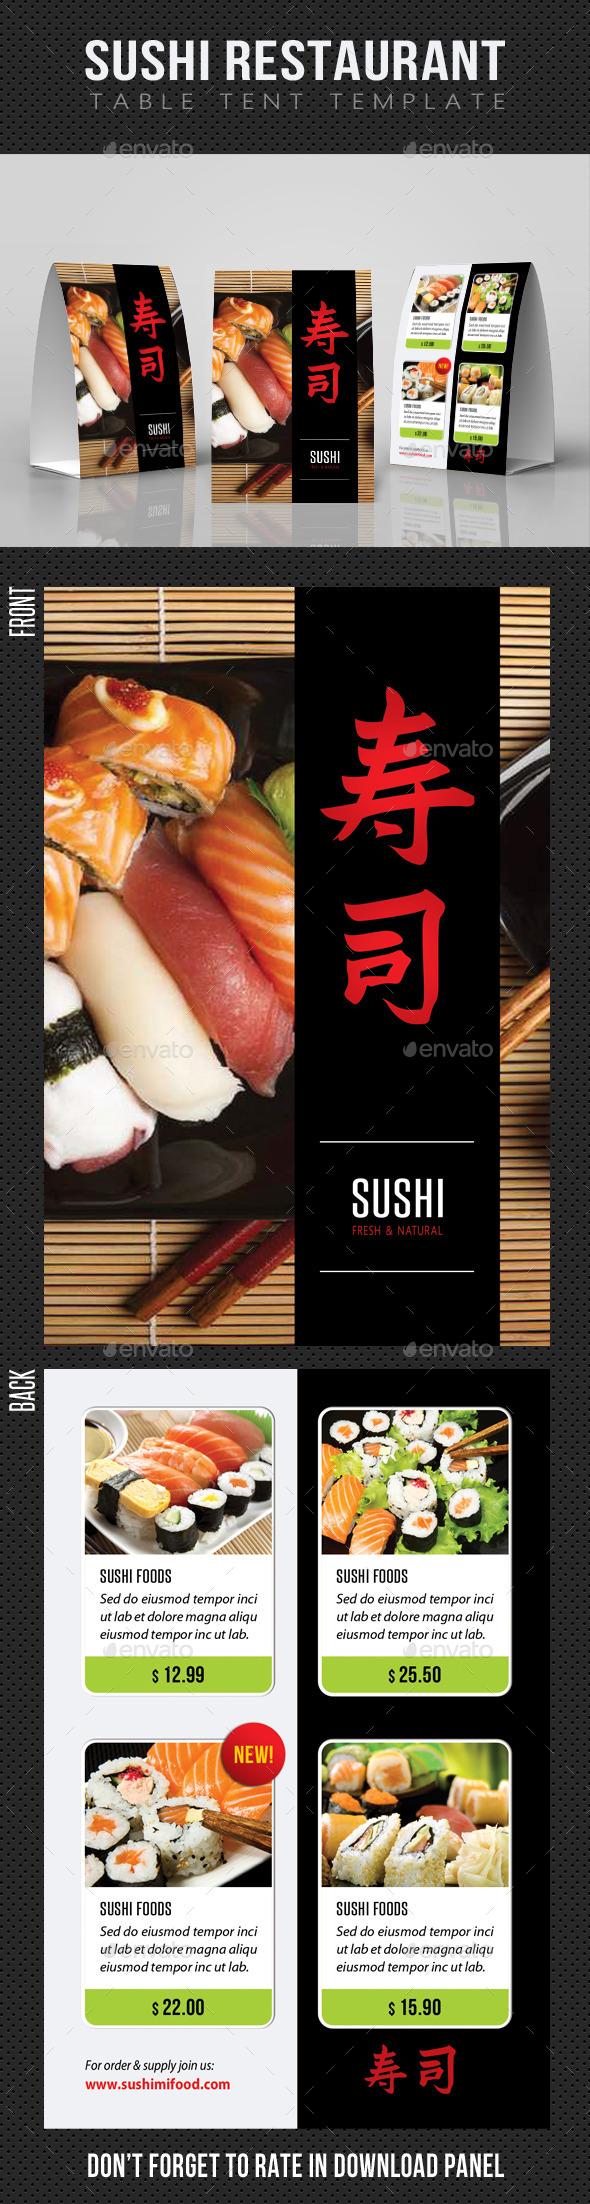 Sushi Restaurant Table Tent Template - Food Menus Print Templates